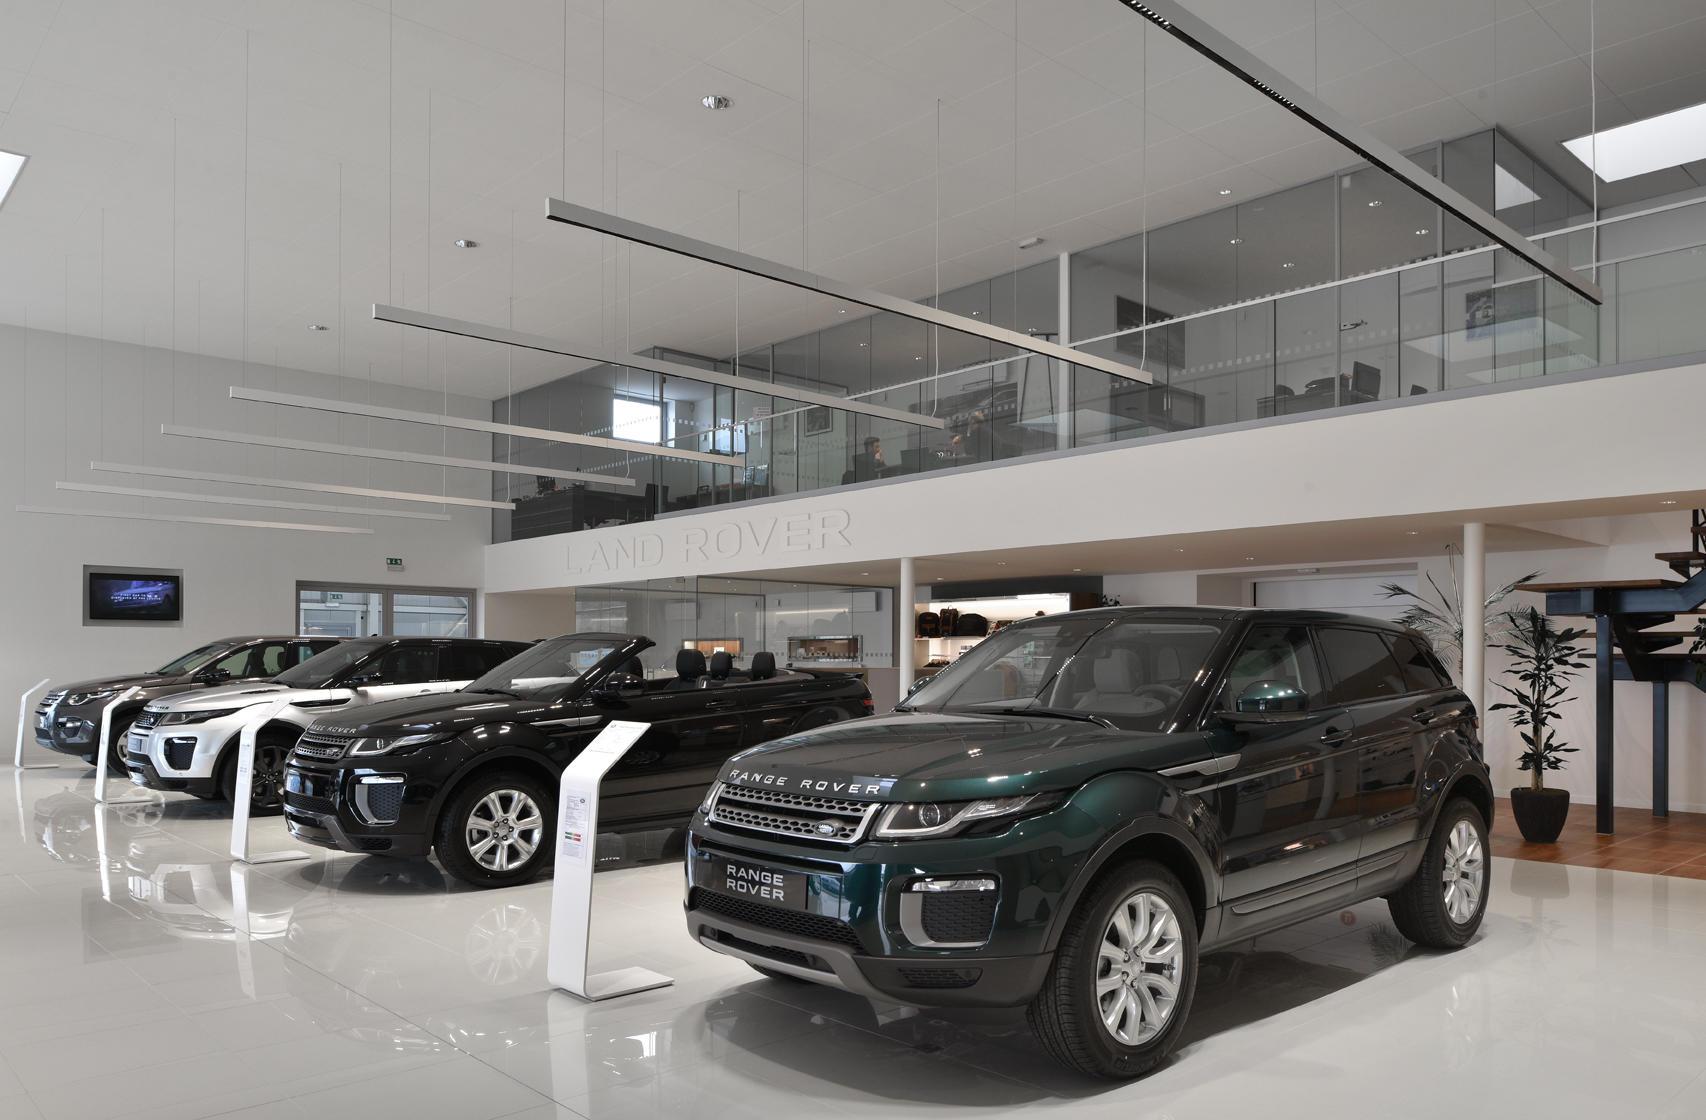 Land Rover Wavre